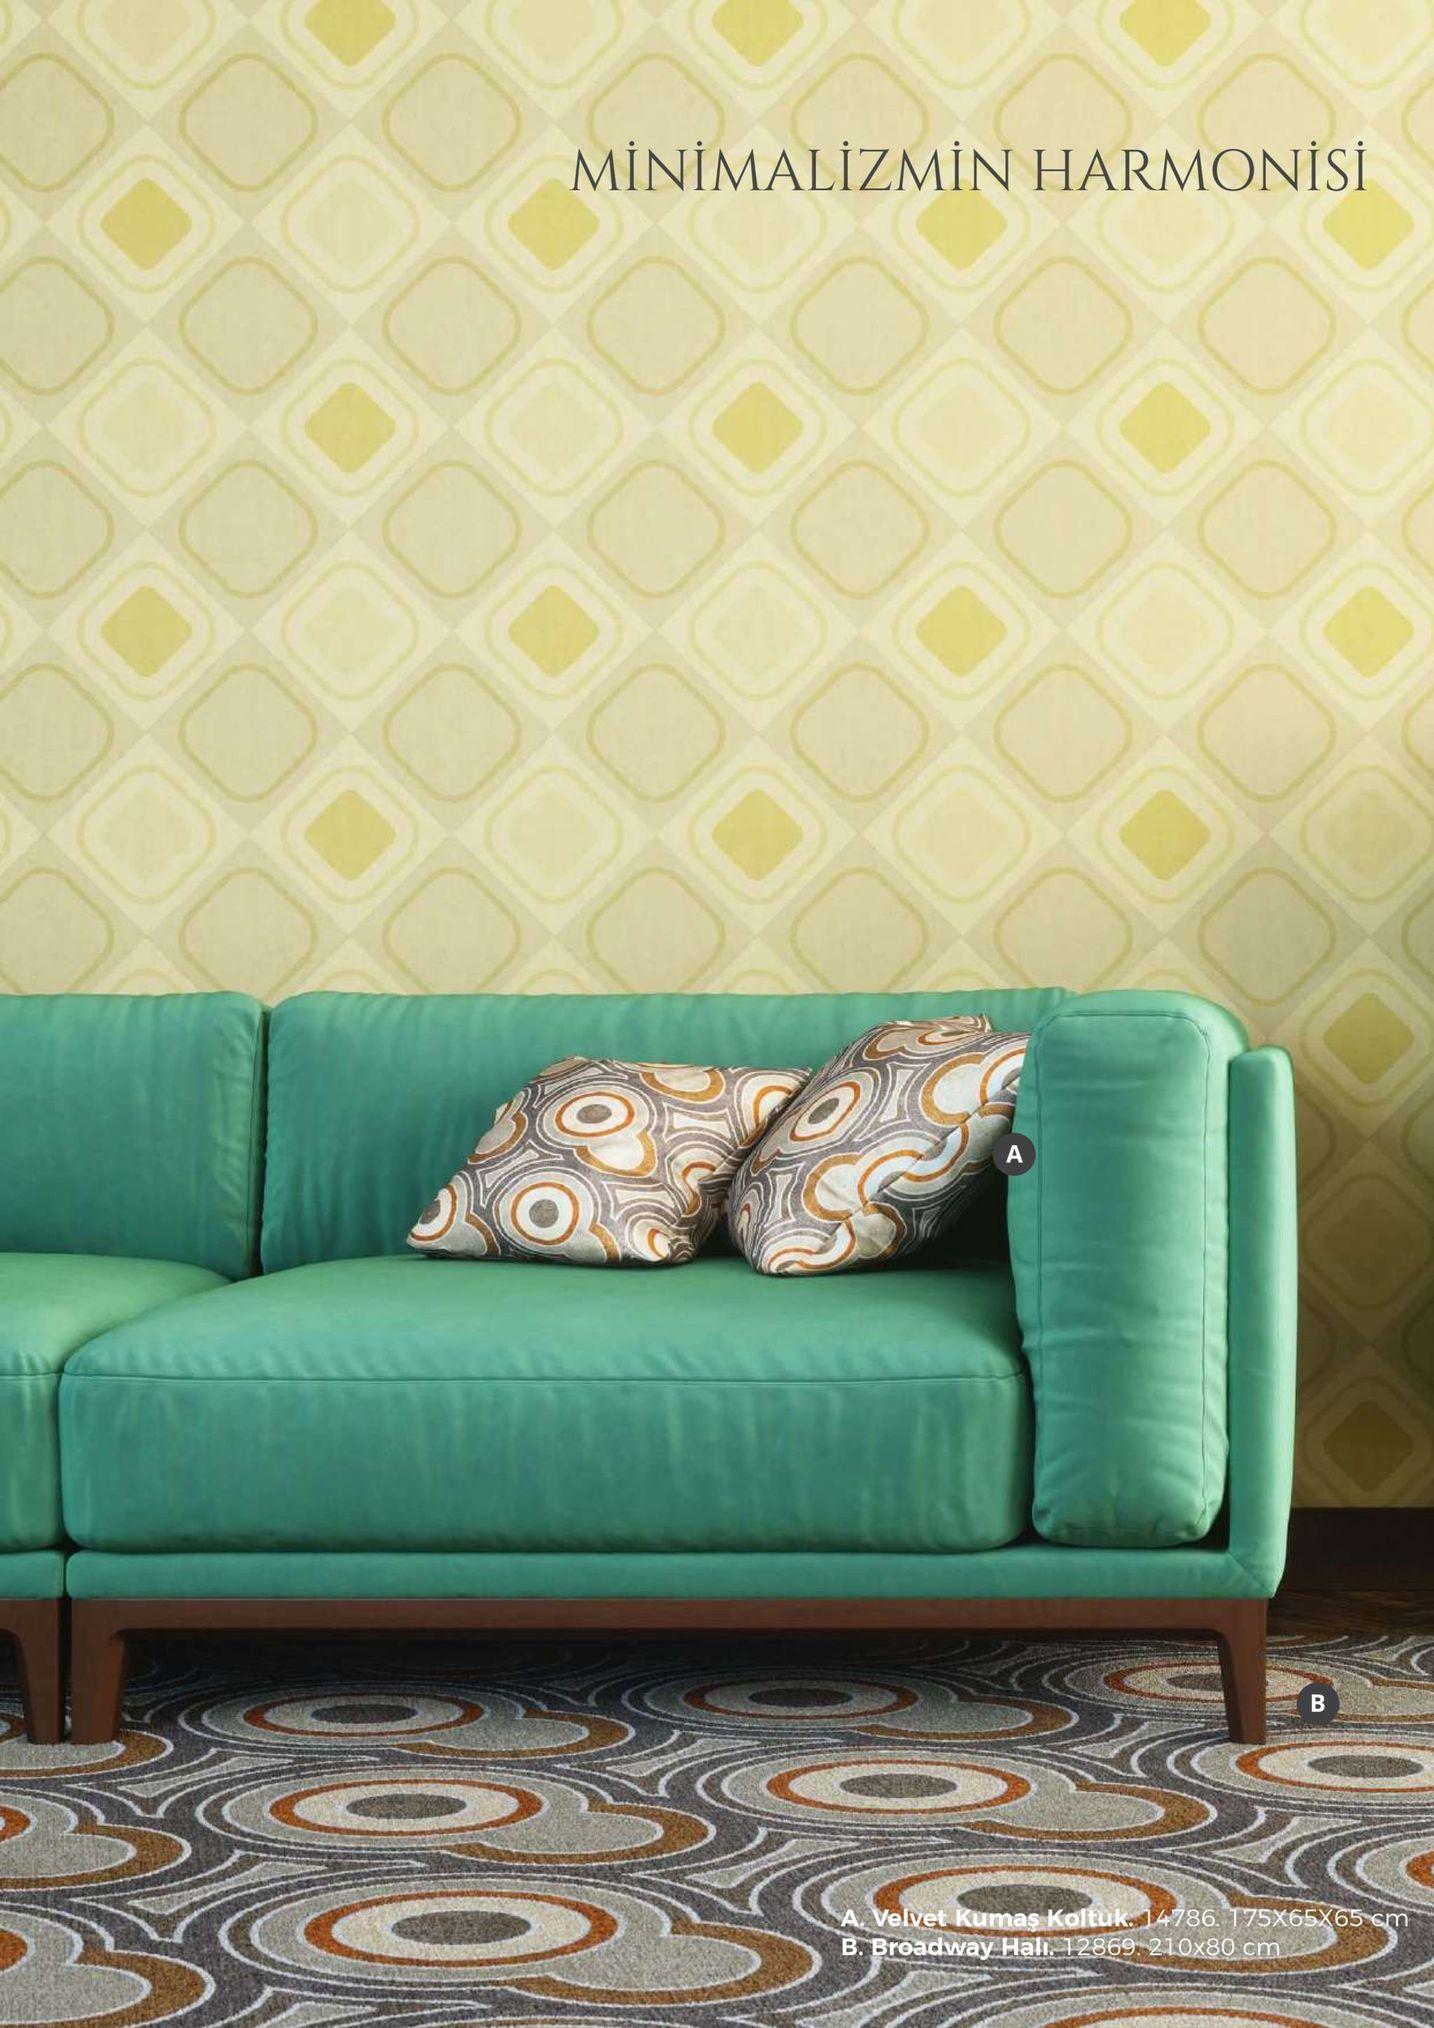 minimalizmin harmonisi velvet kumaş koltuk4786